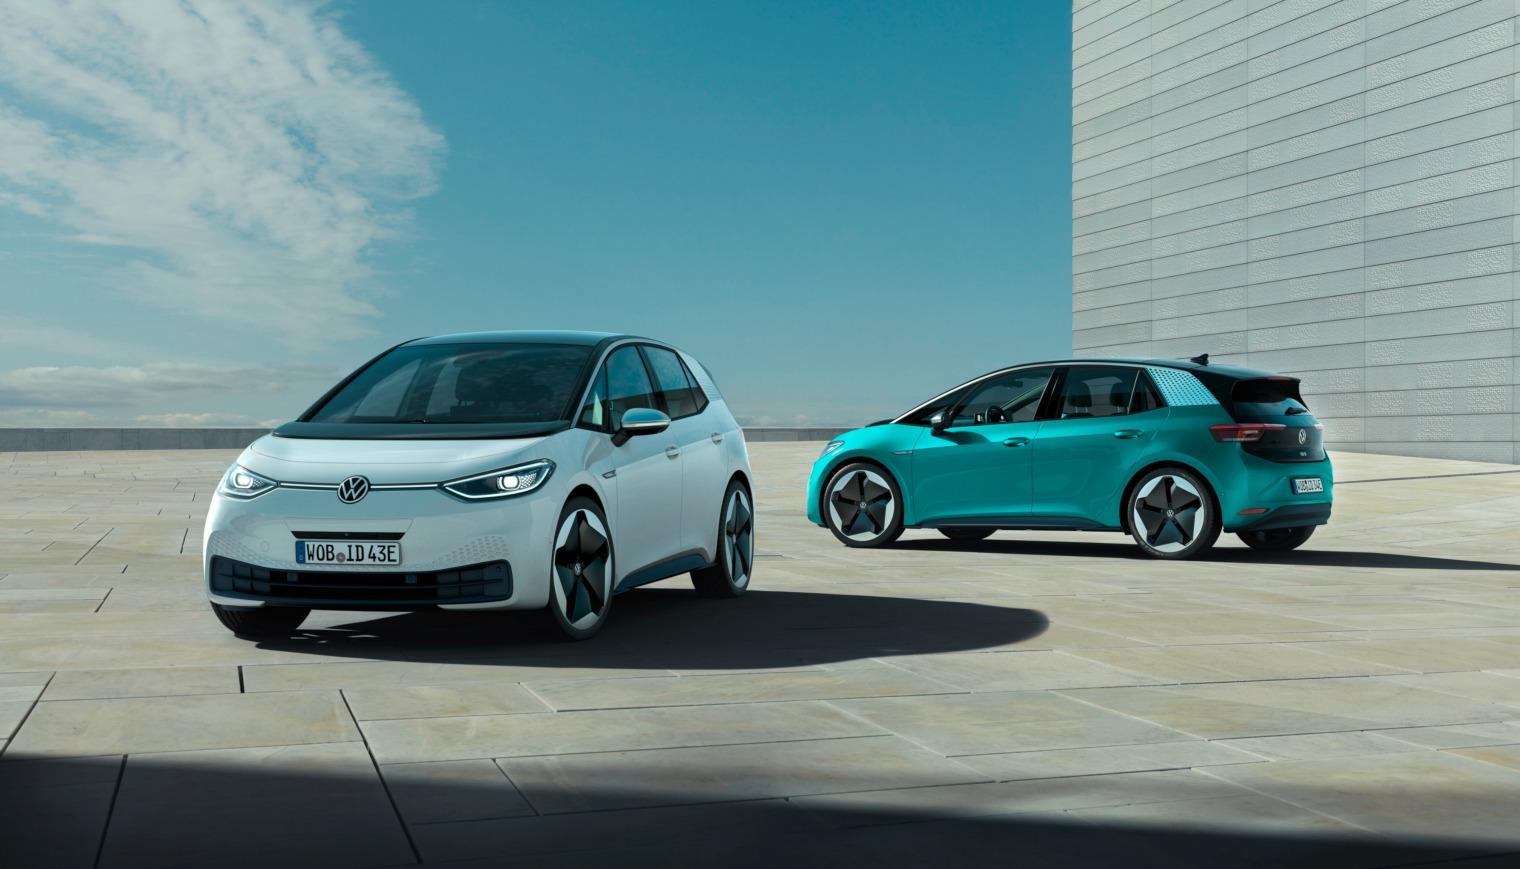 prezzi-nuova-Volkswagen-ID.3-2019